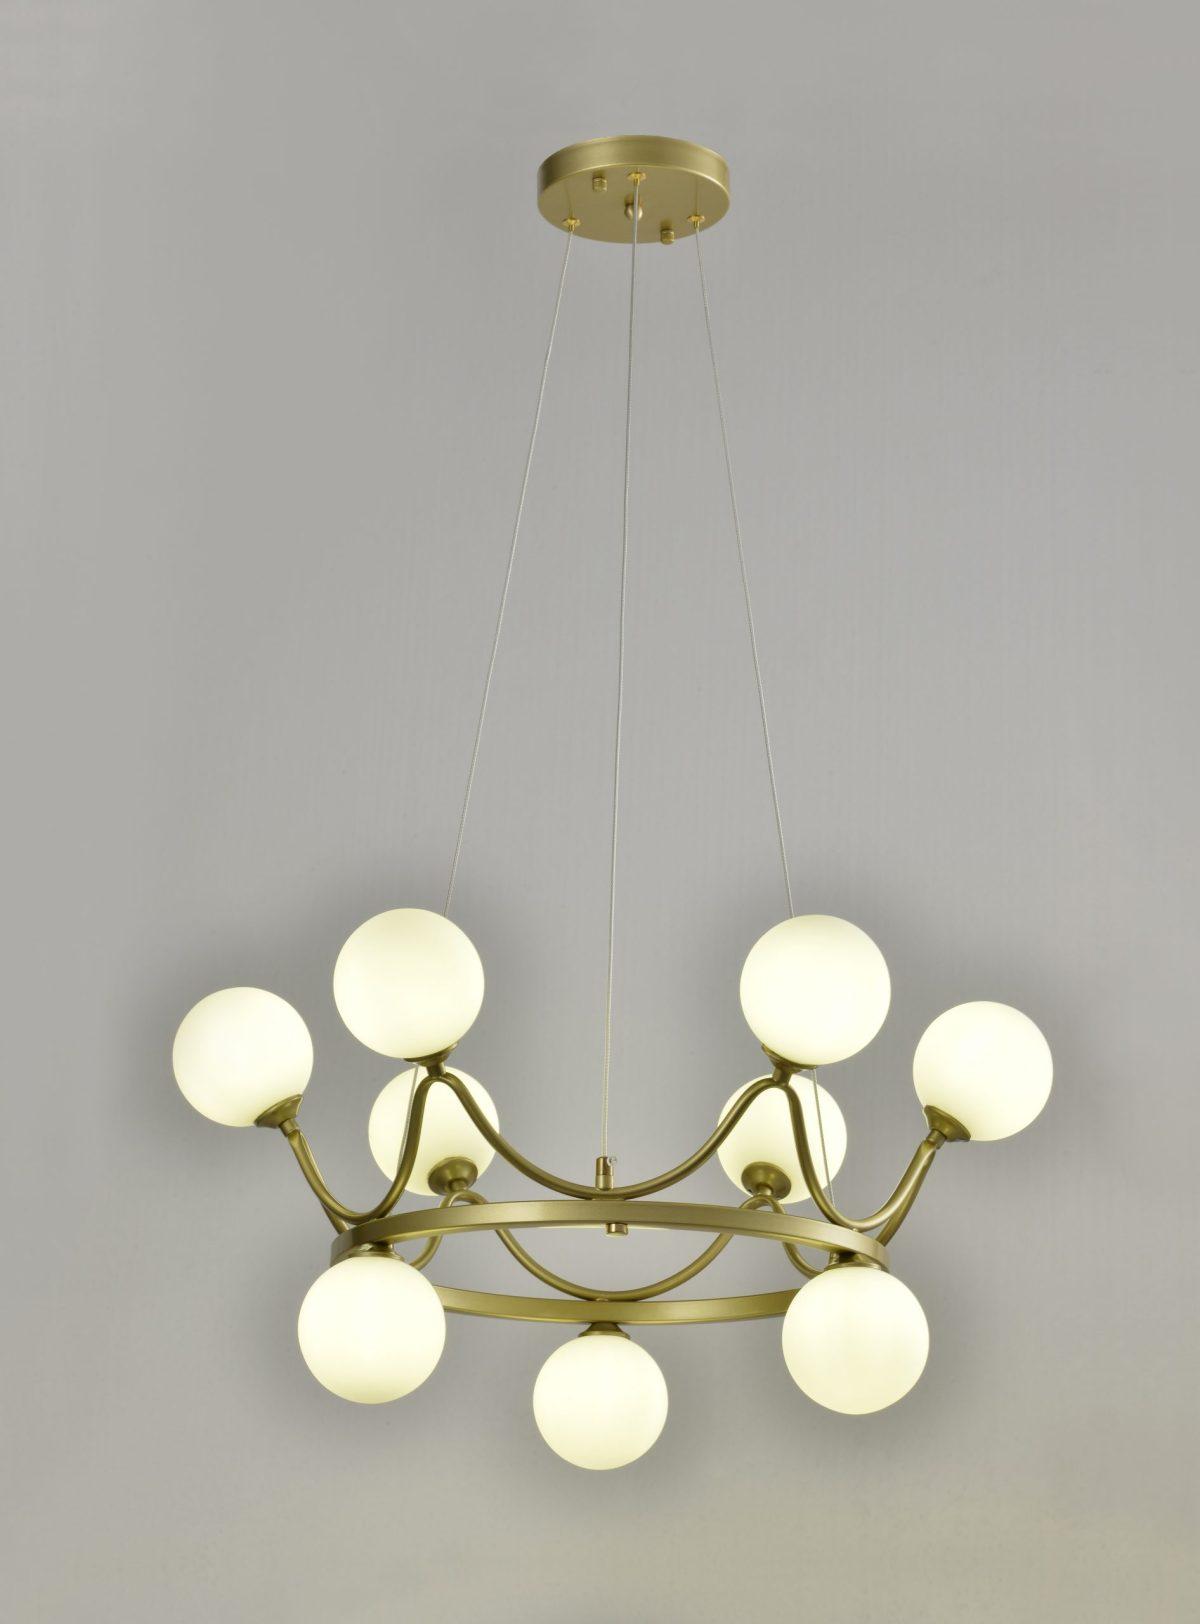 Indoor Lighting Pendants Hanging Contemporary Ceiling Light – CP15